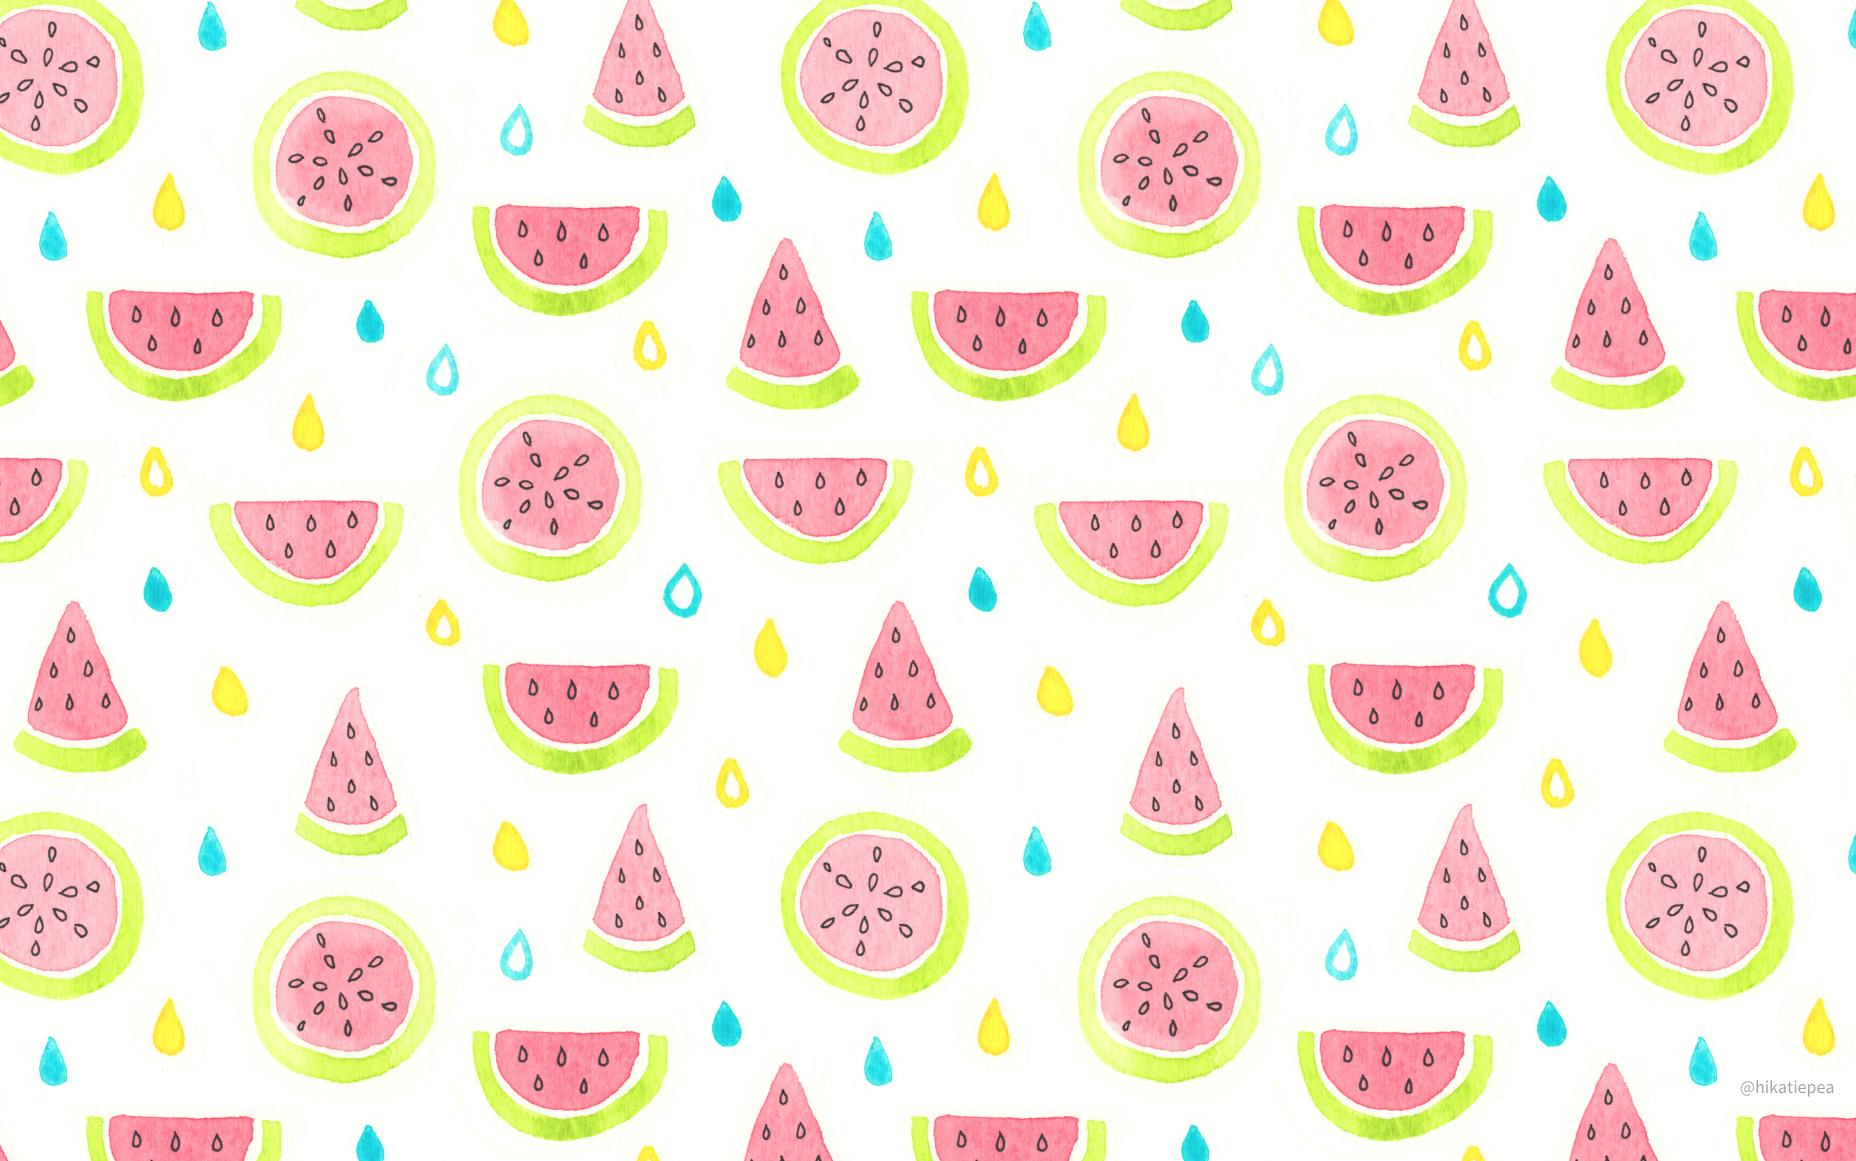 Watermelon Wallpaper For Desktop